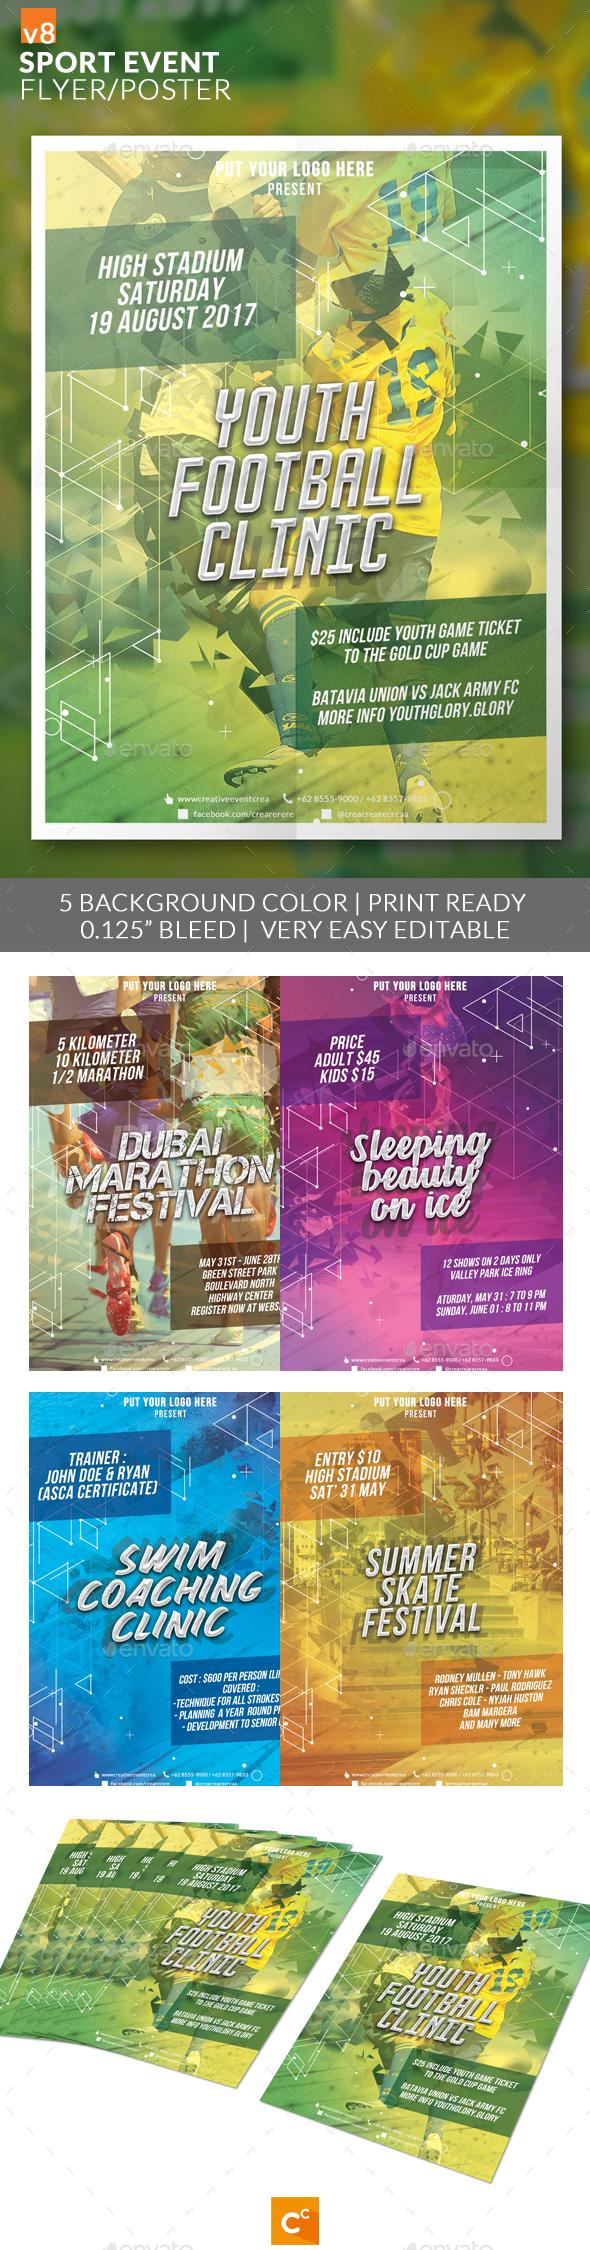 Sport Event Flyer/Poster v8 - Sports Events